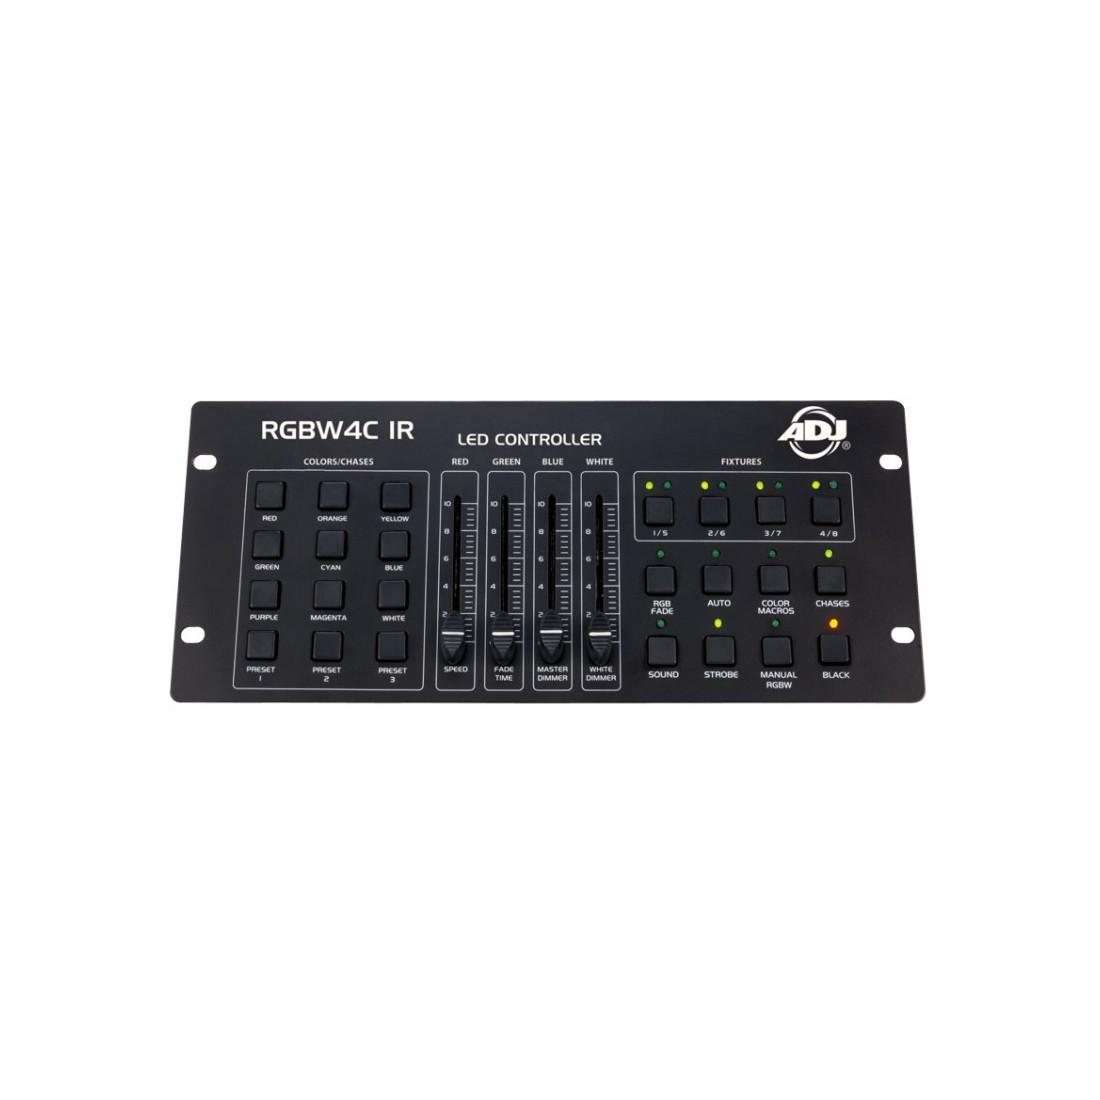 American DJ RGBW4C IR Lighting 32 Channel RGBA or RGBW LED Light Controller - New